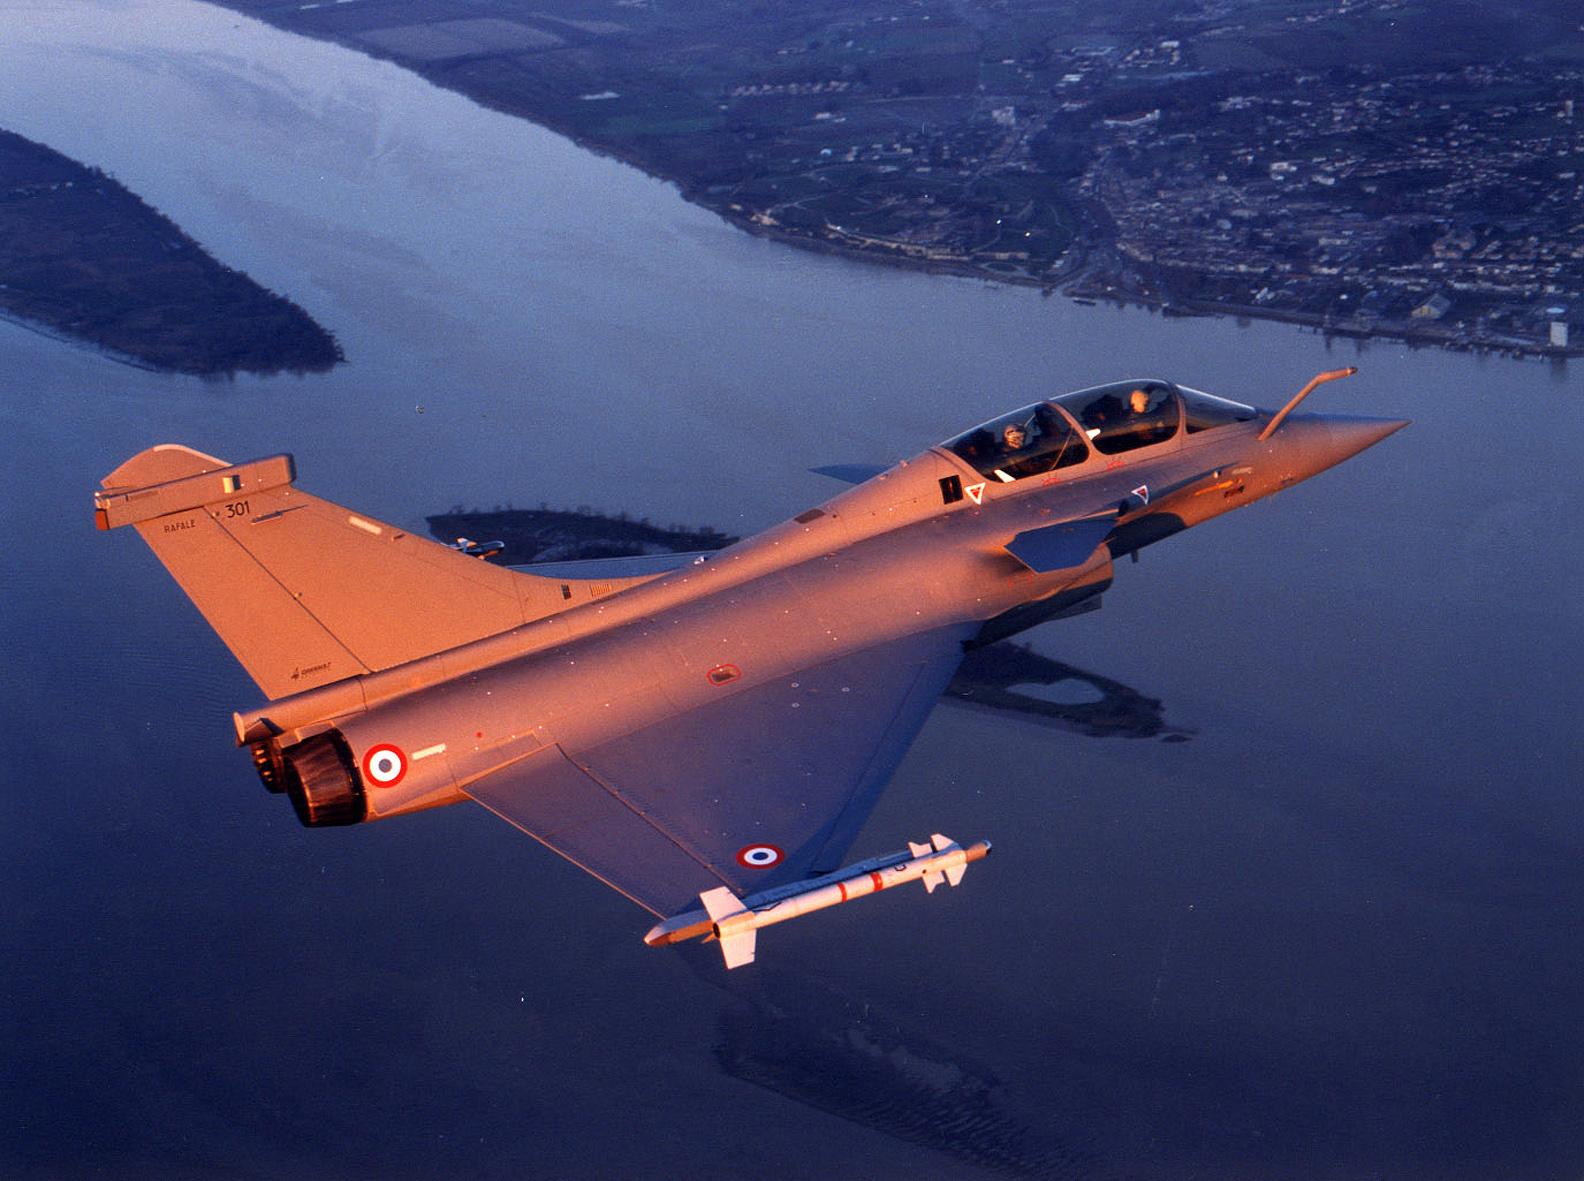 francuski-rafale-b-301